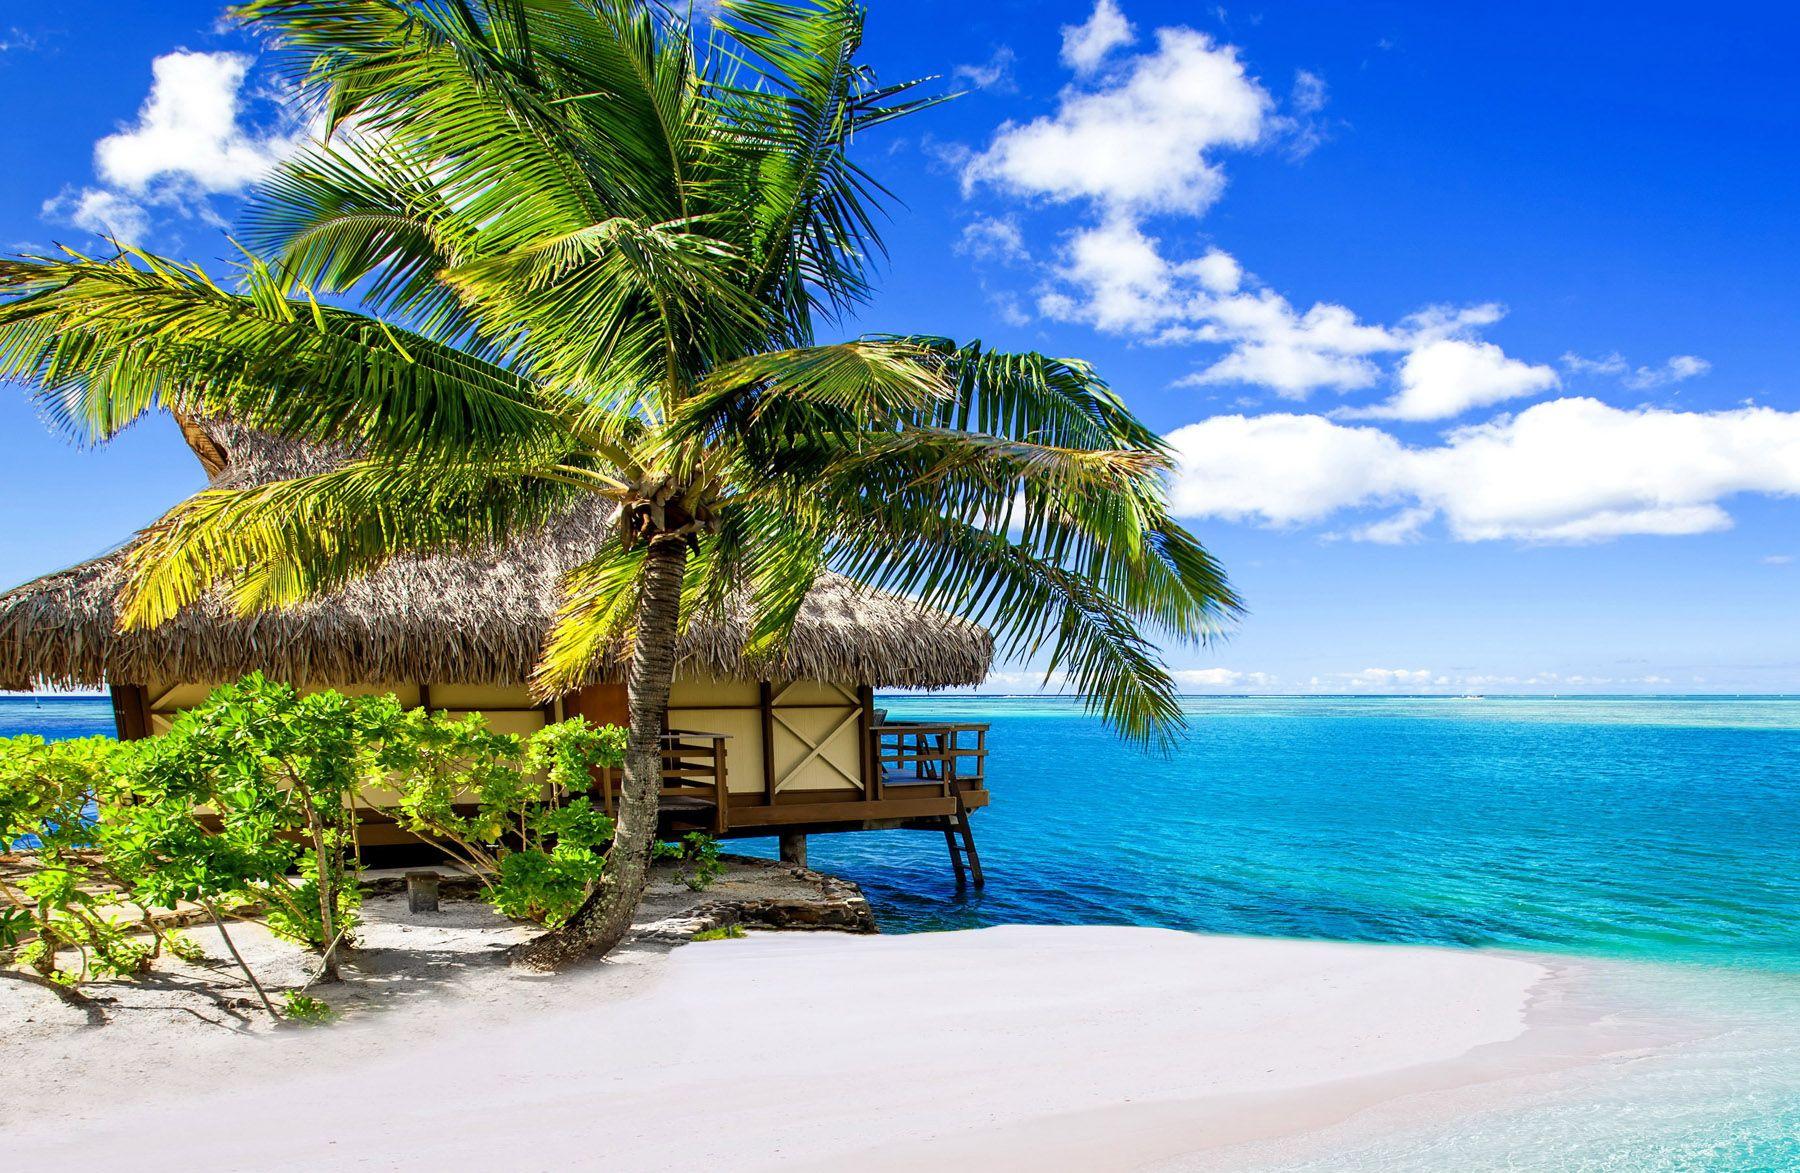 Bora Bora Island Tahiti French Polynesia Tourist Attractions ชายหาด